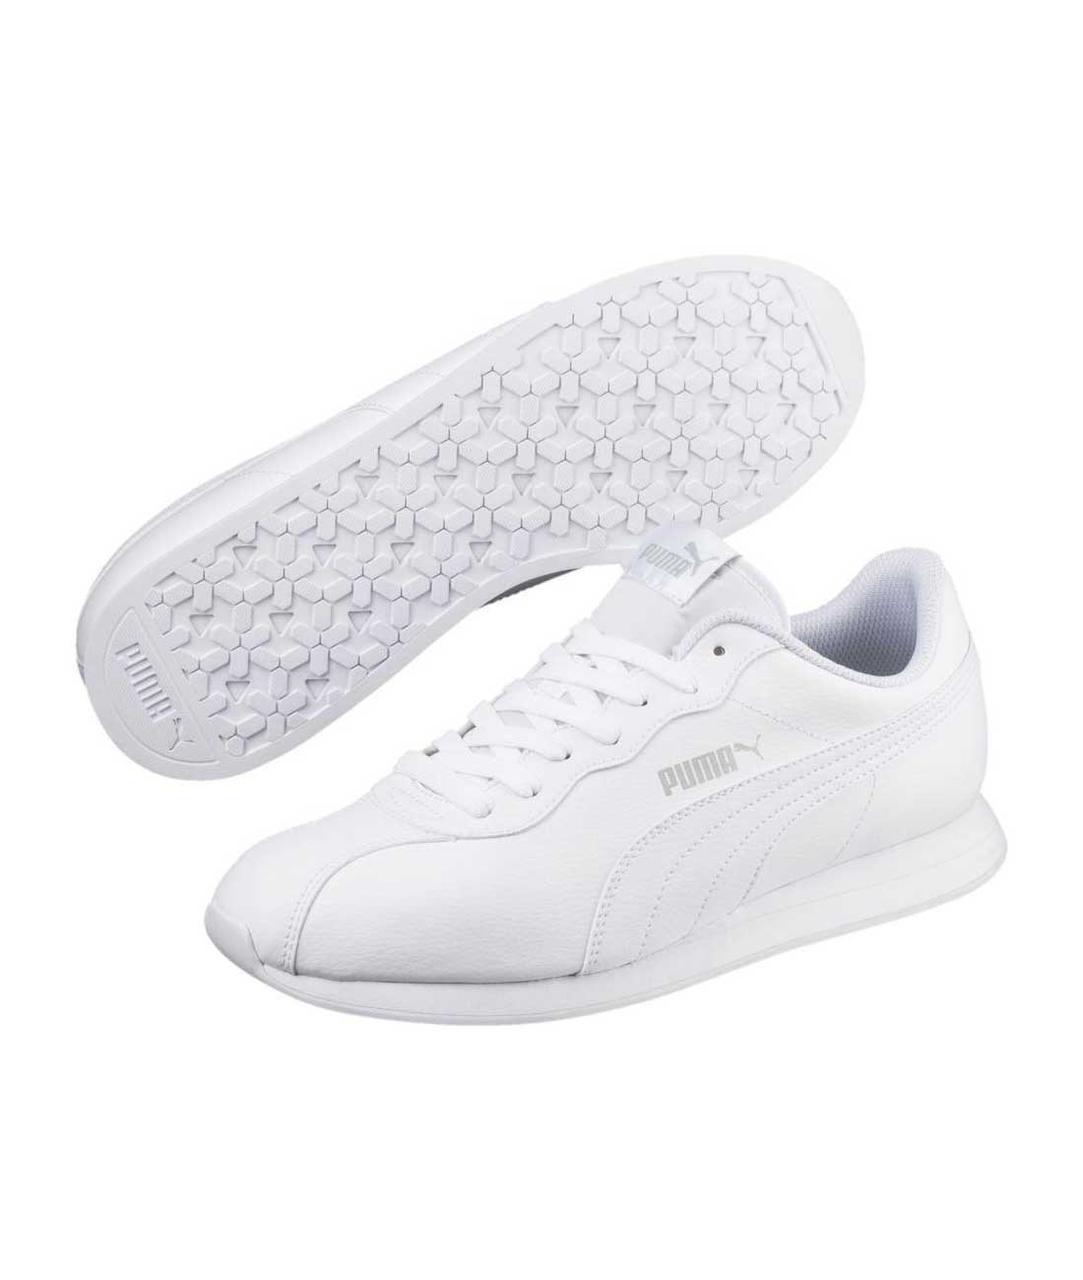 Женские белые кроссовки Puma Turn II